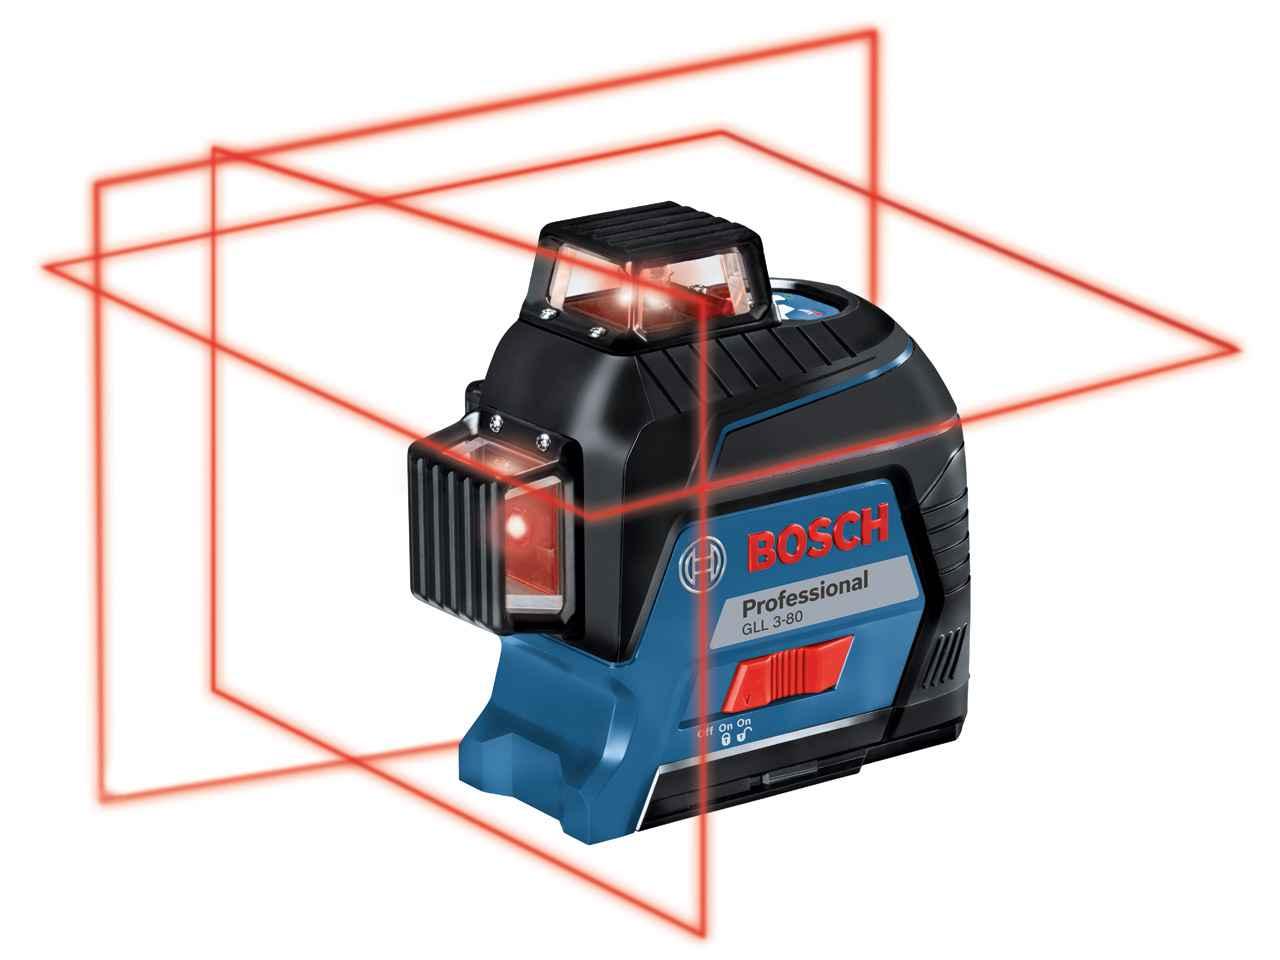 bosch 0601063s00 professional cross line laser   ebay